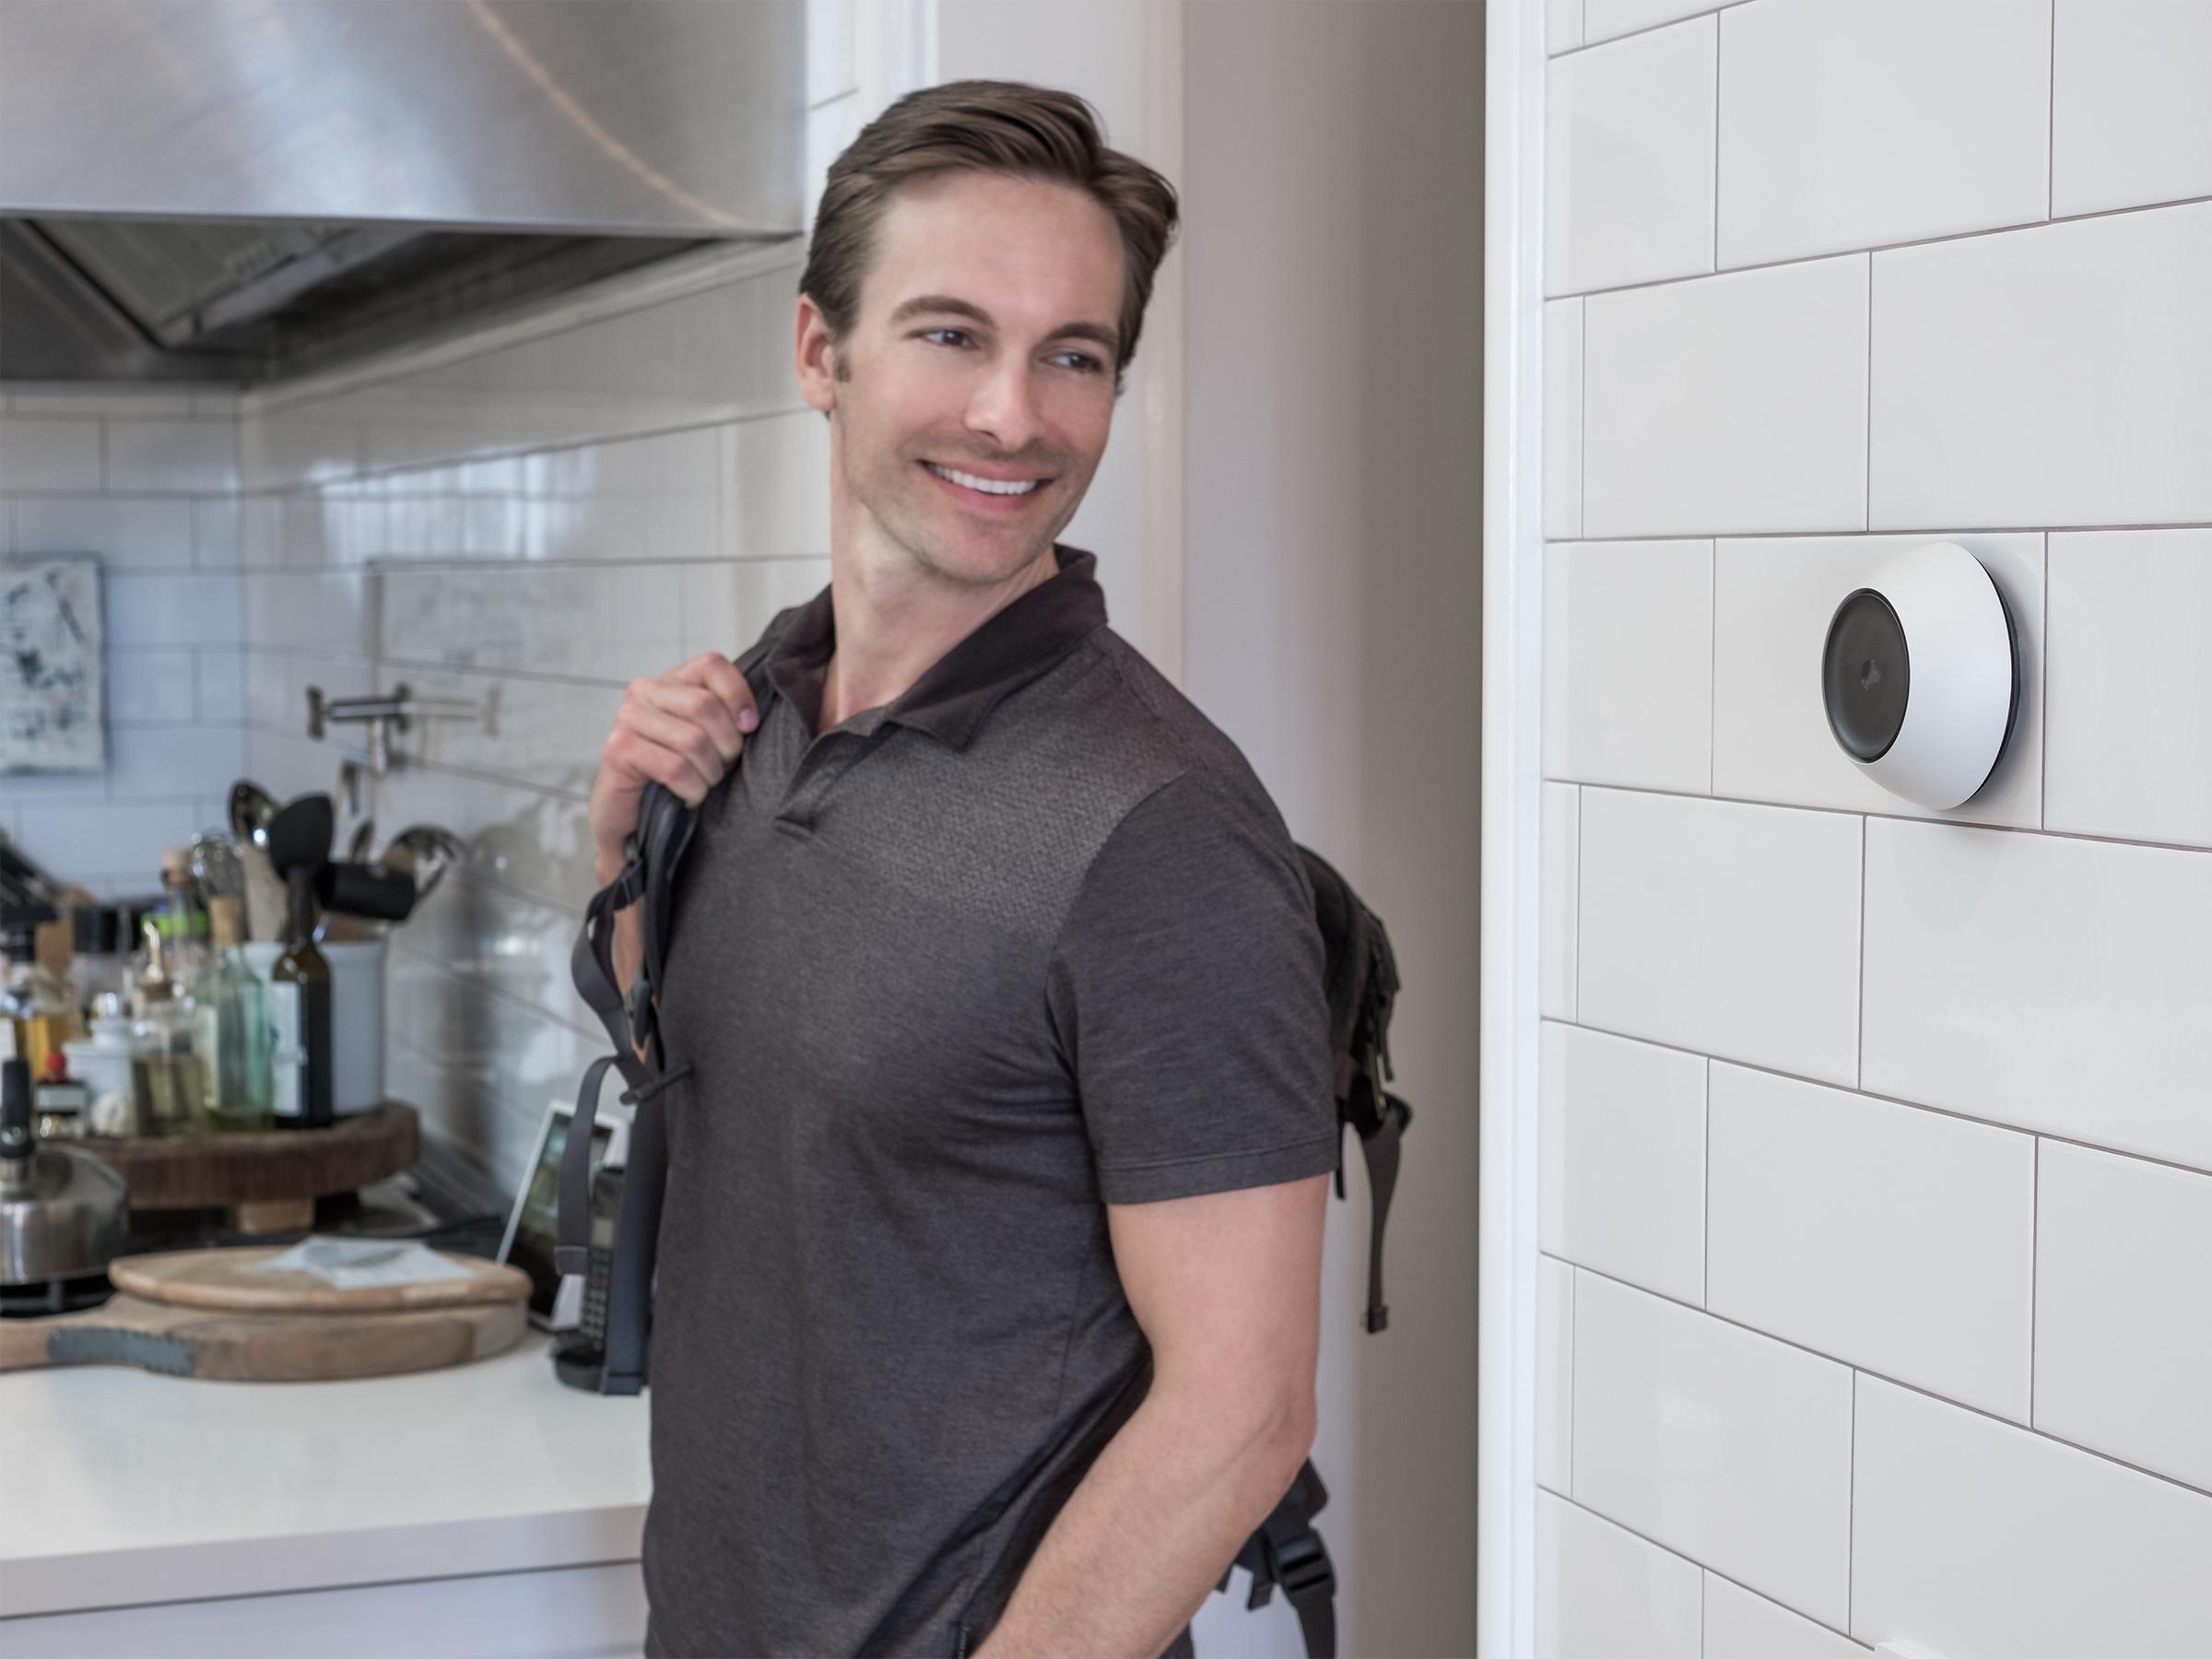 Josh-Lifestyle-Kitchen-Wall-1.jpg